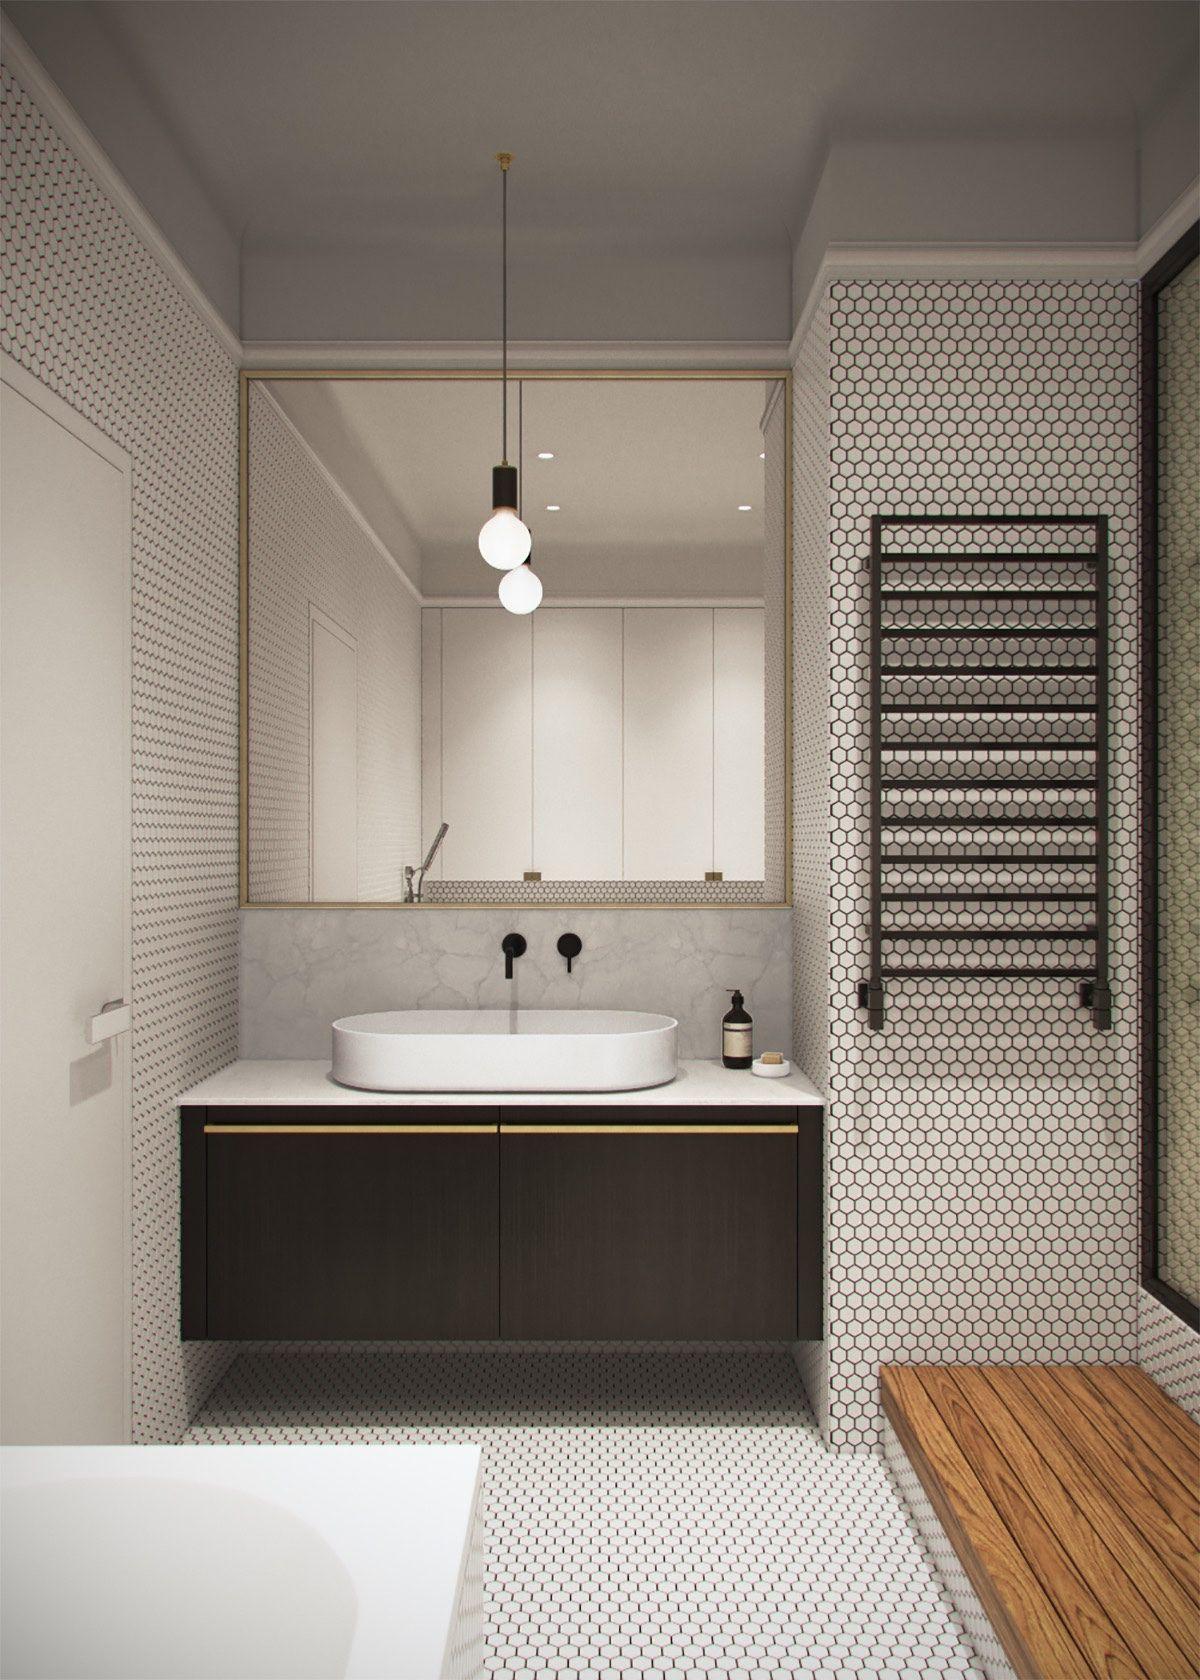 zwarte radiator - Badkamer en toilet | Pinterest - Badkamer, Wc en ...